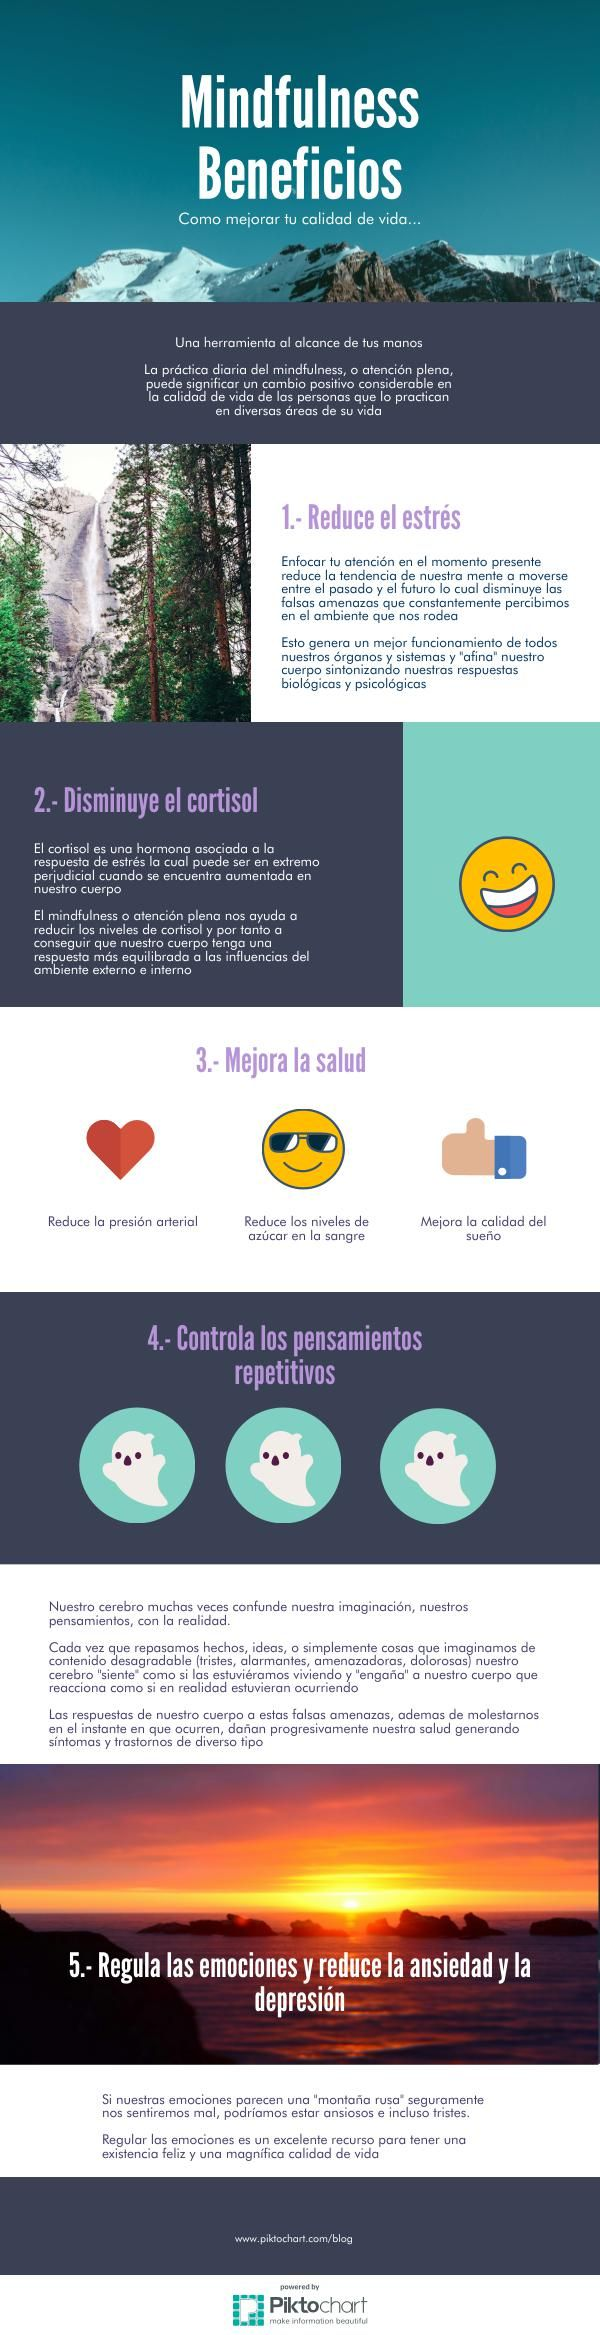 SERBAL Beneficios del mindfulness | @Piktochart Infographic